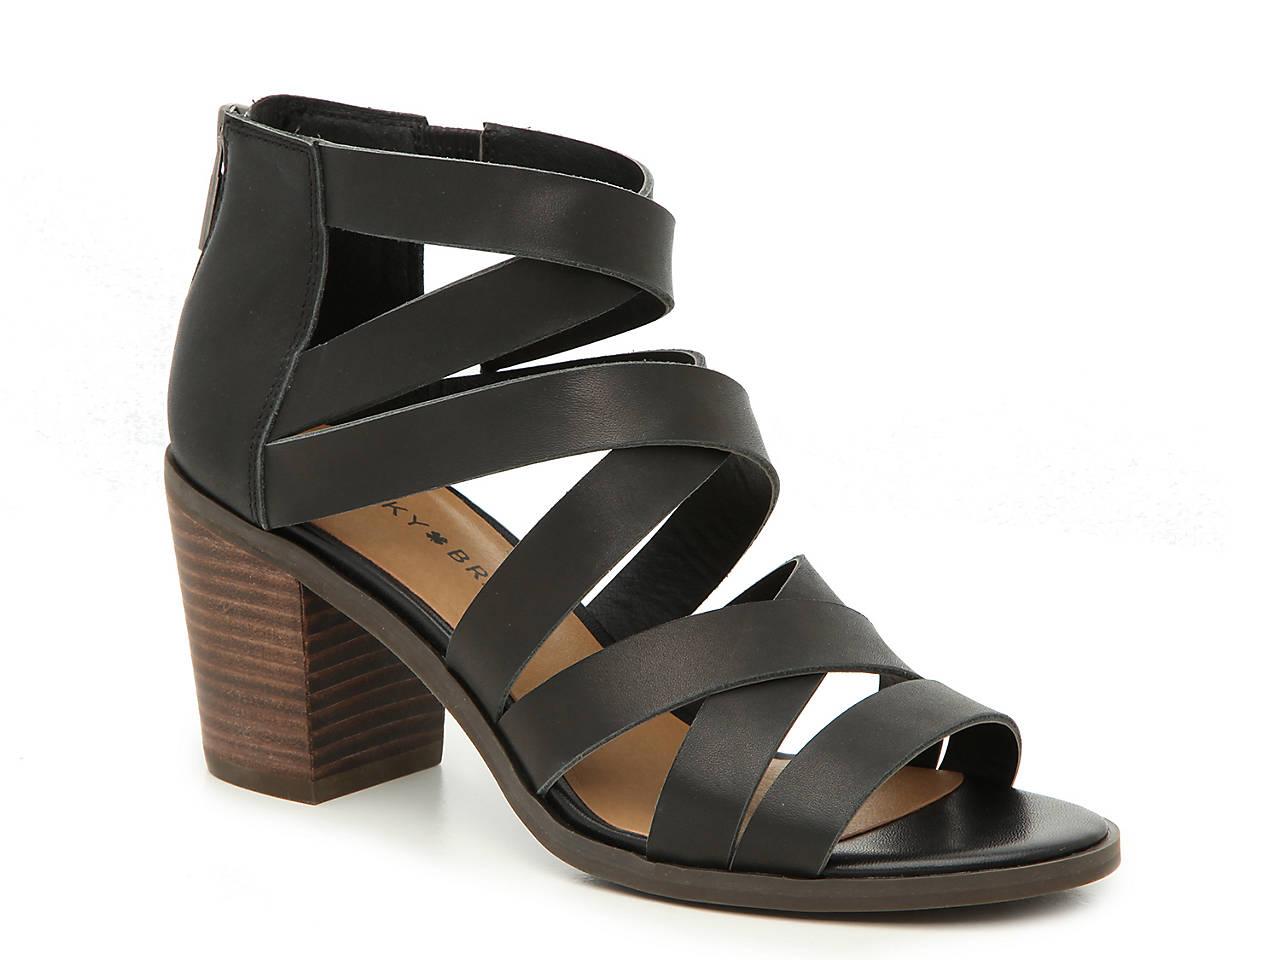 e6c0574da Lucky Brand Kallia Sandal Women s Shoes